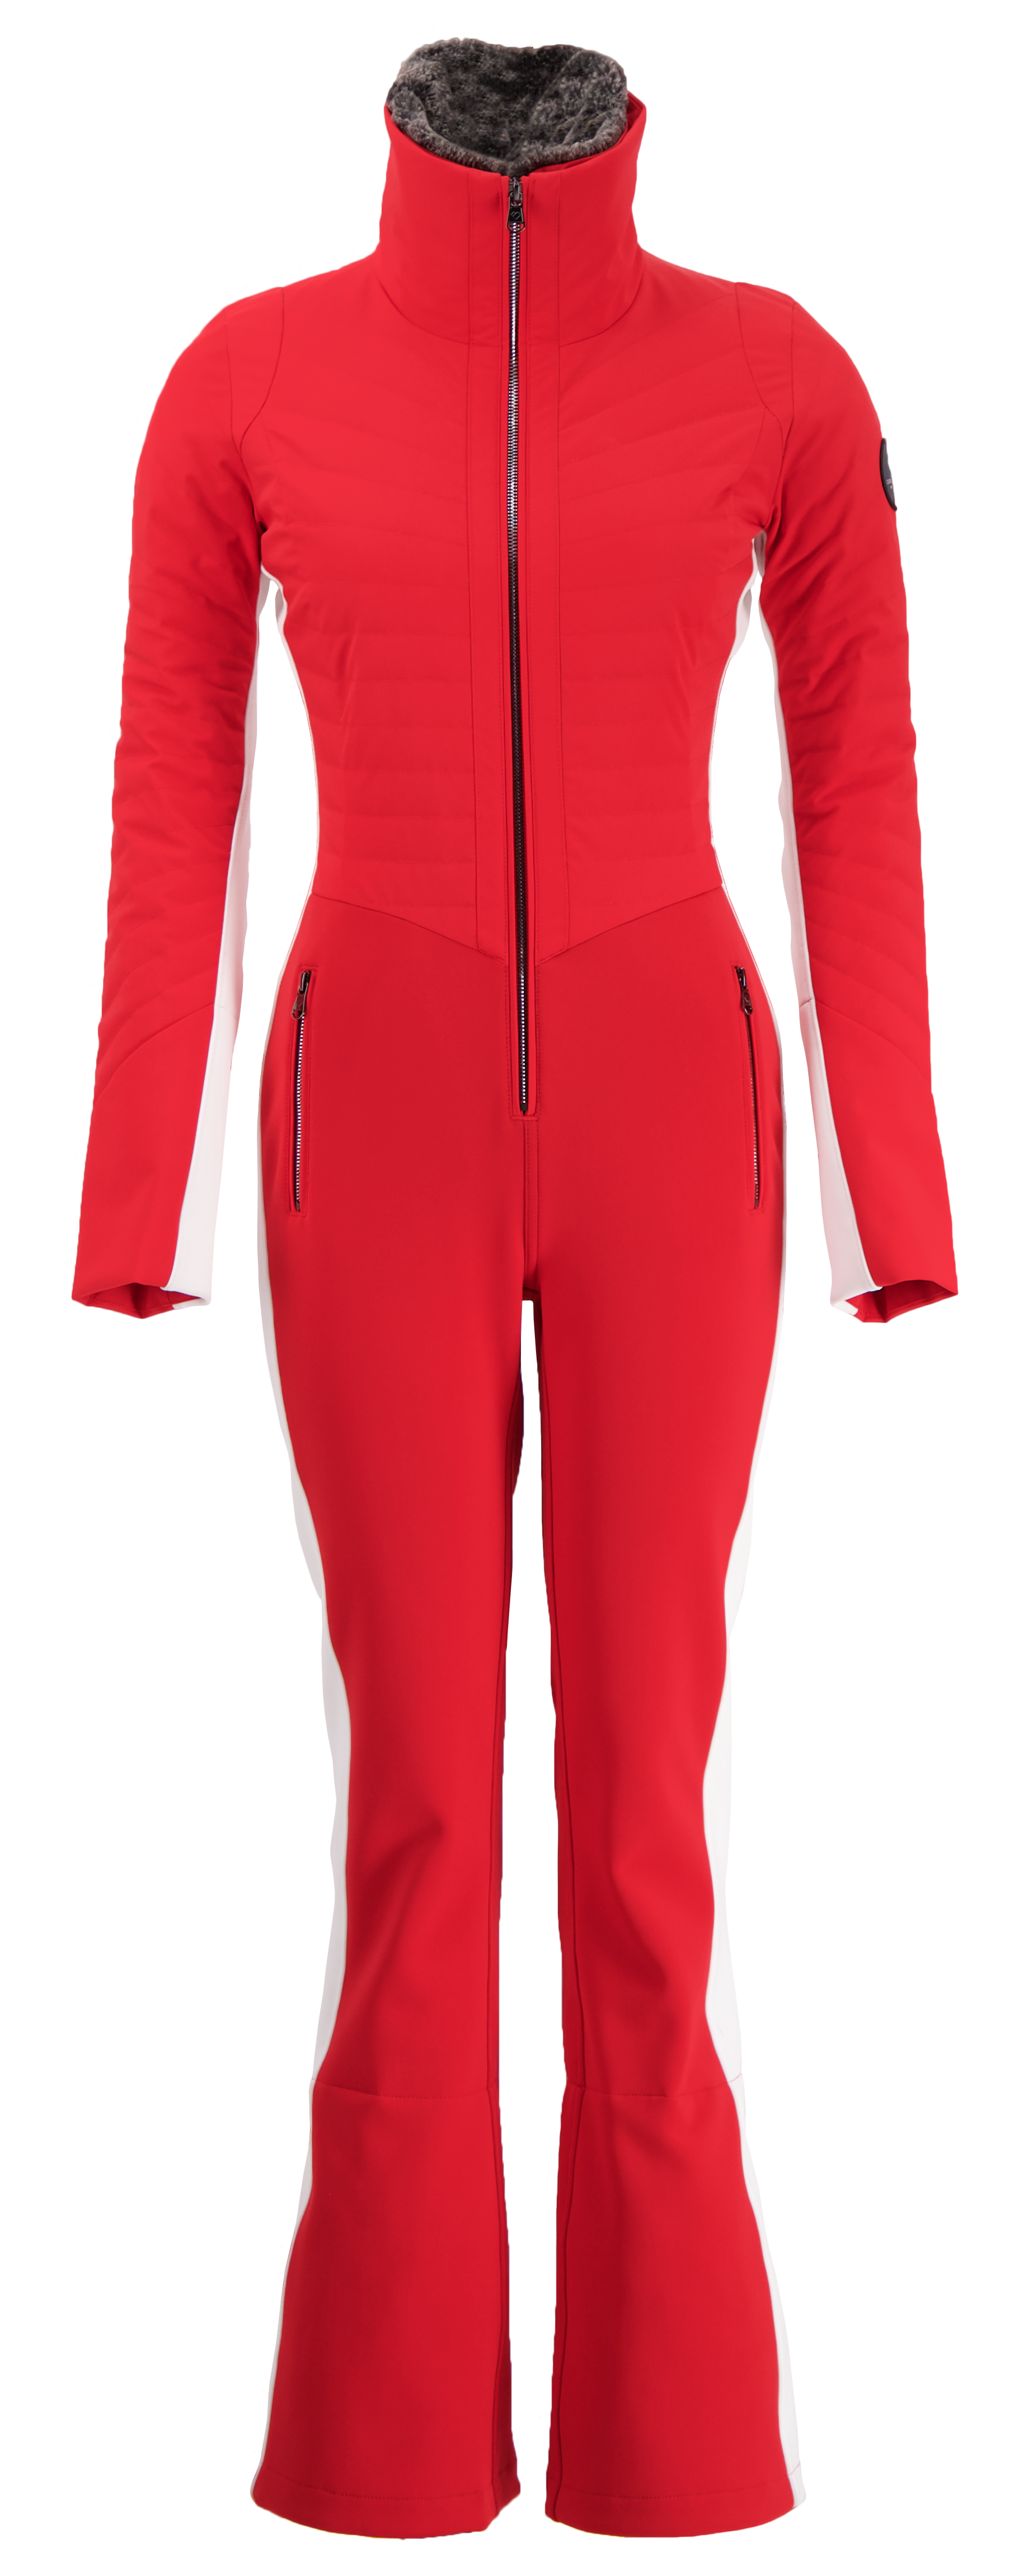 après-ski clothes.2